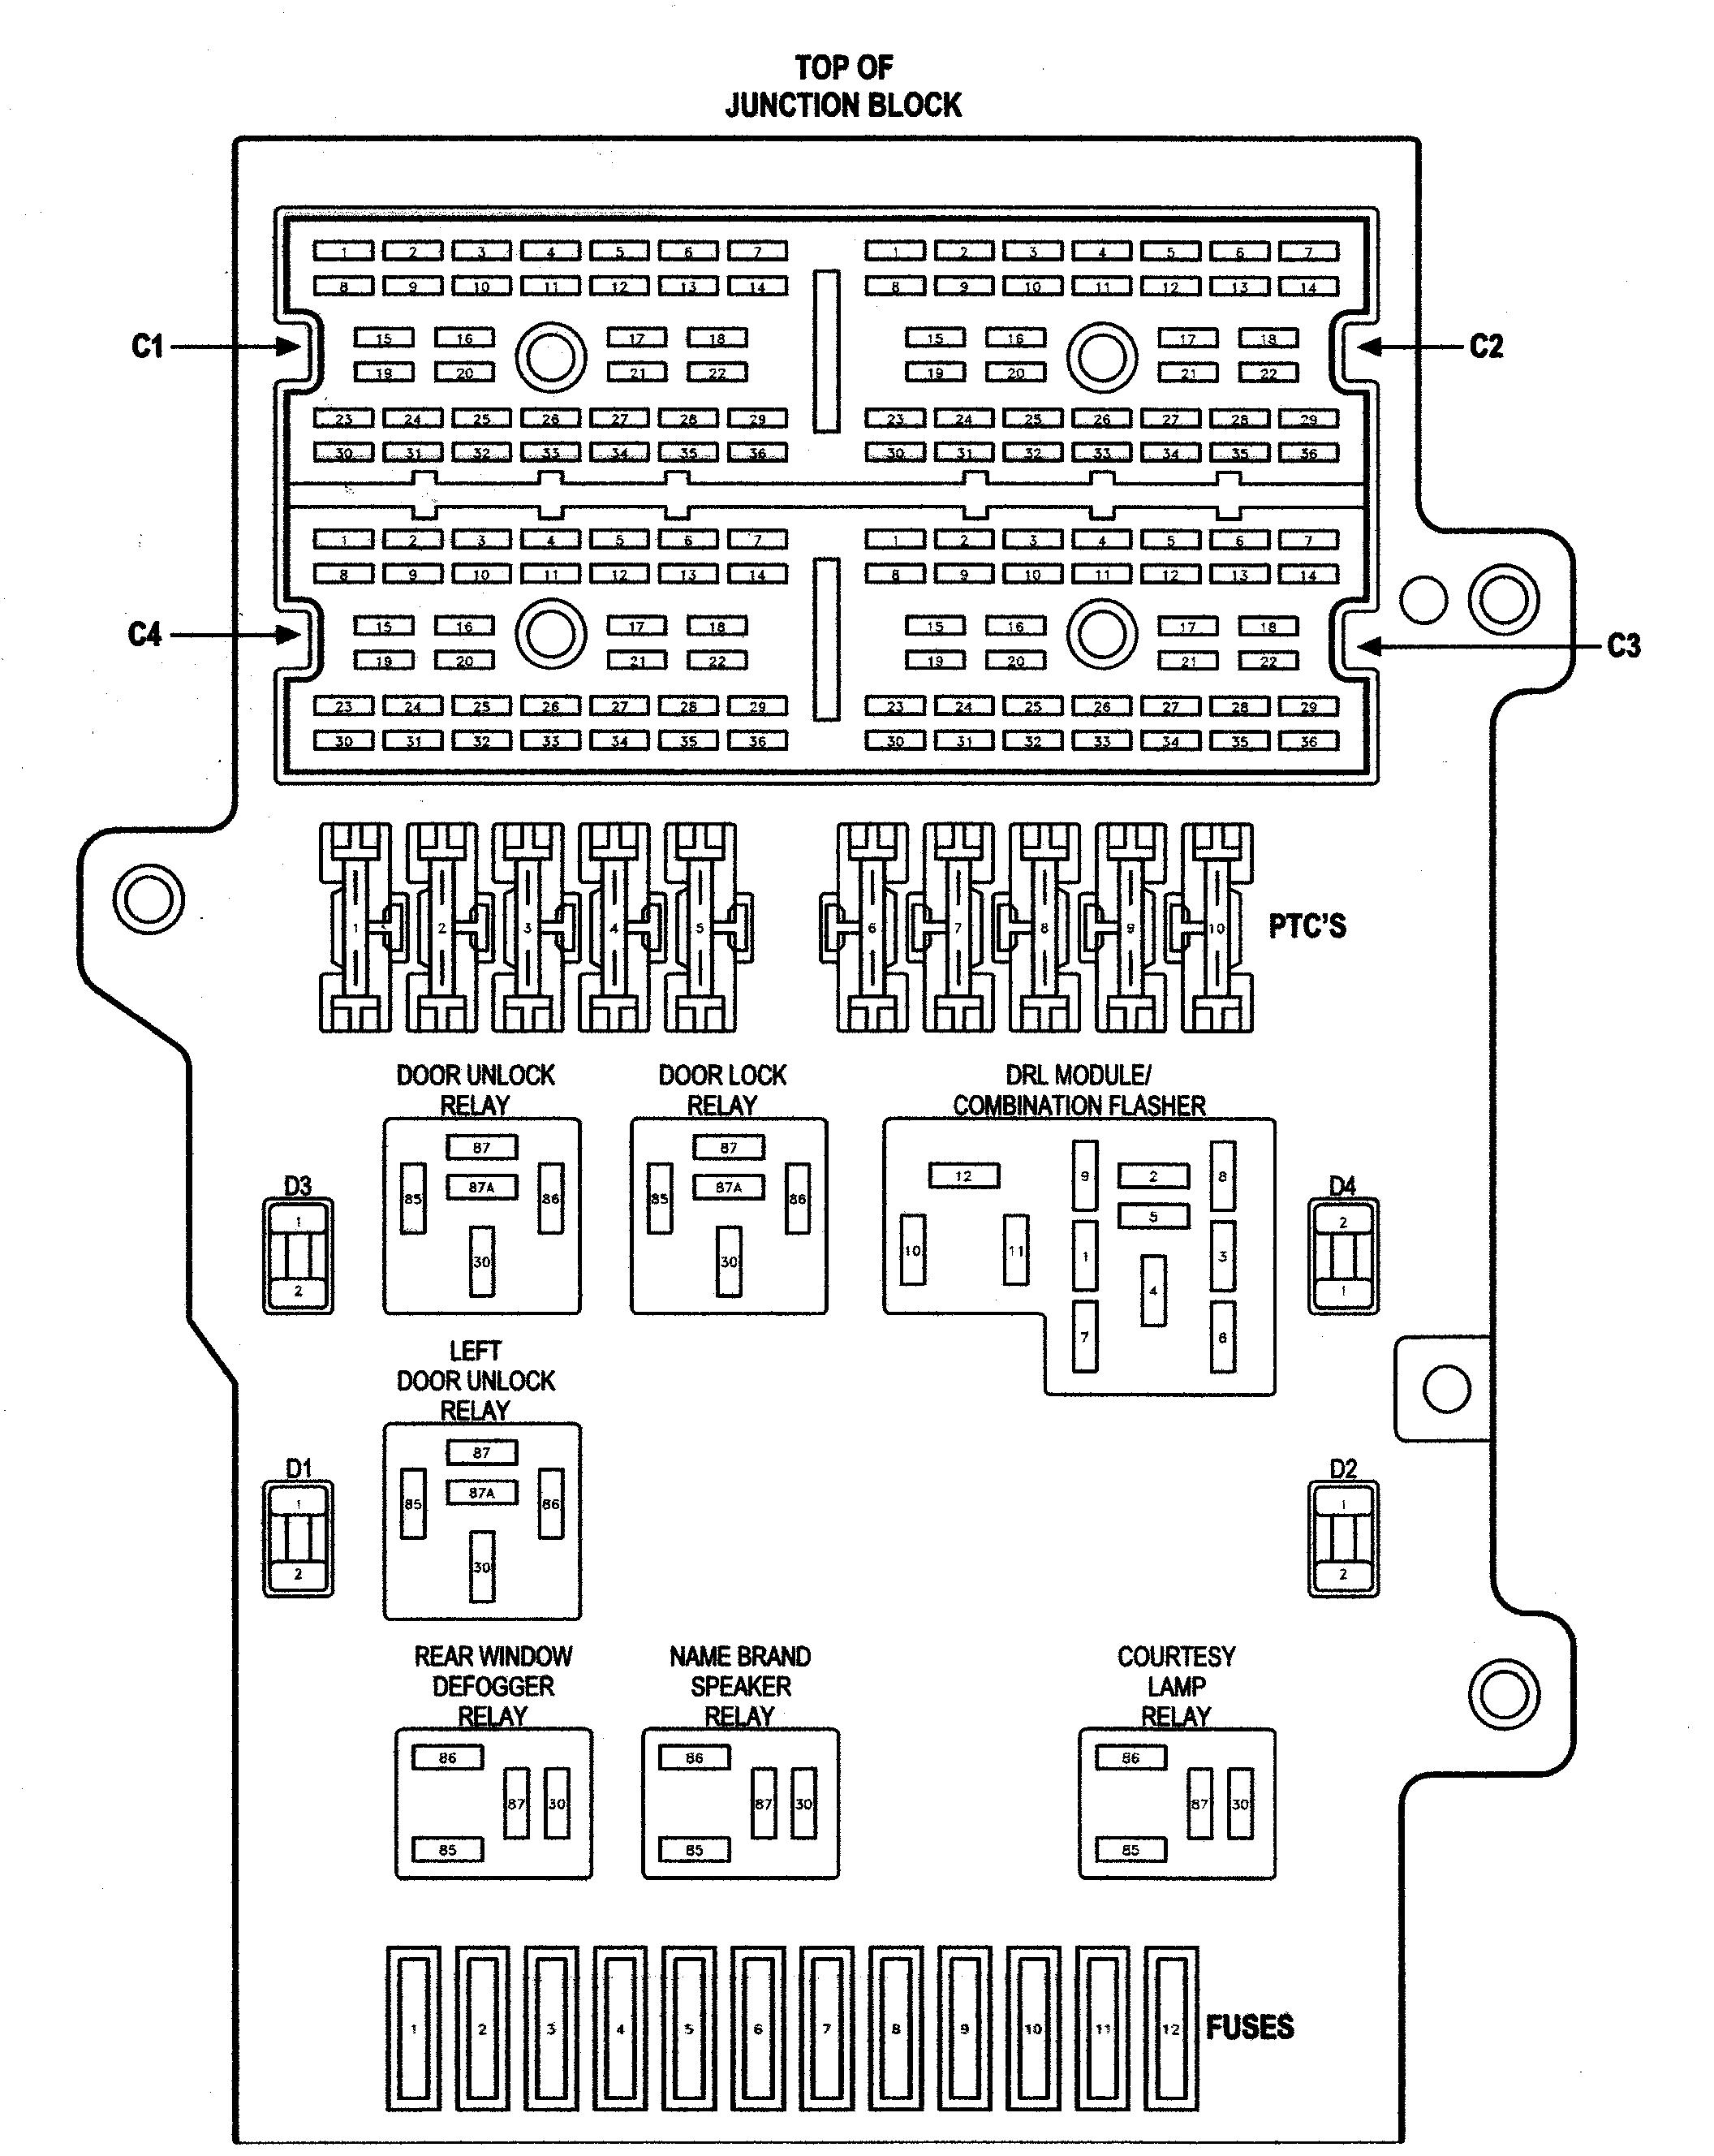 NH_9344] 00 Chrysler Grand Voyager Fuse Box Download DiagramCoun Pelap Zidur Loida Unre Ifica Bedr Monoc Majo Umize Penghe Isra  Mohammedshrine Librar Wiring 101